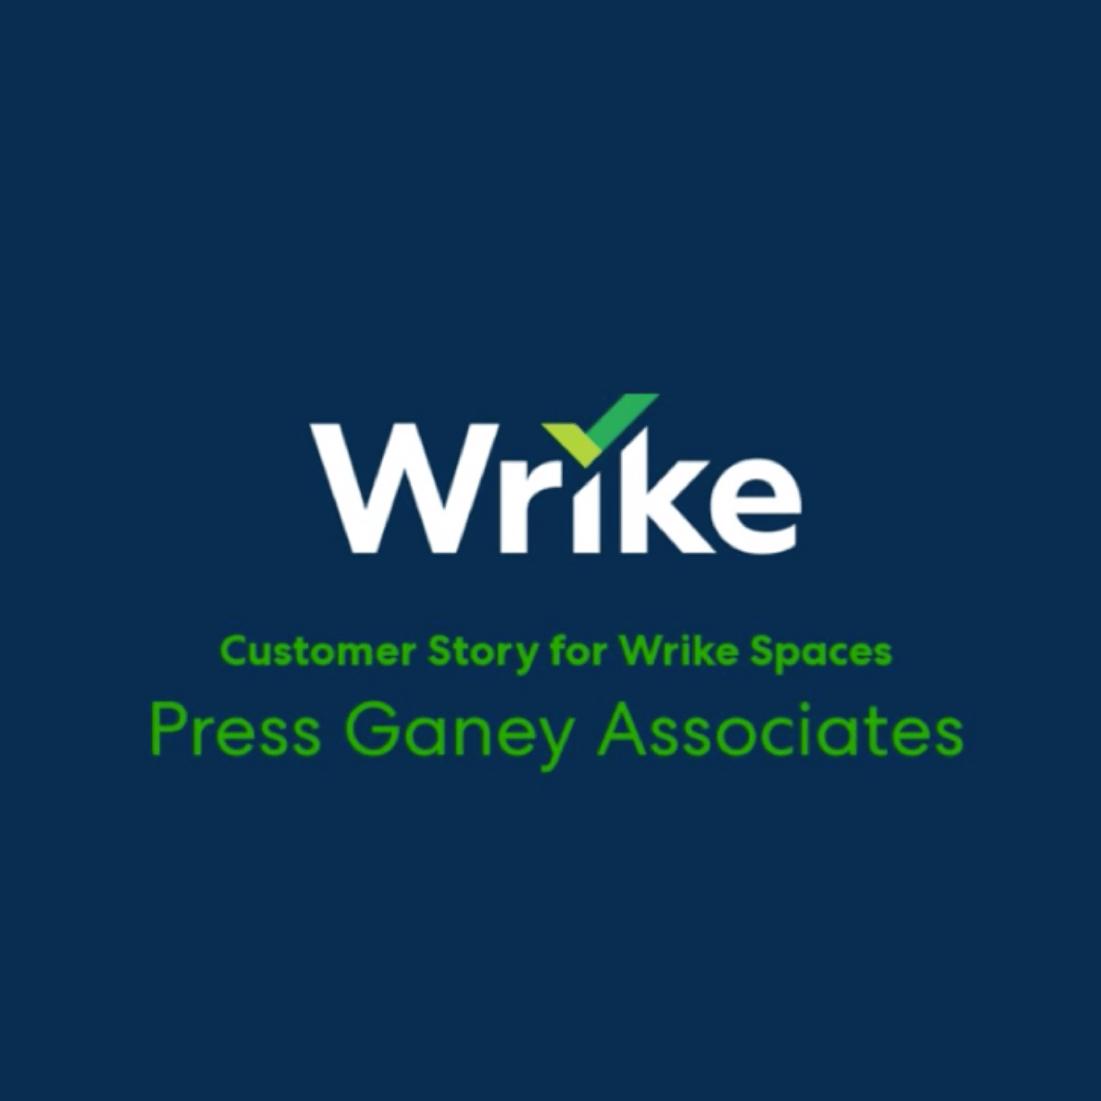 Wrike Sample Customer Story Video